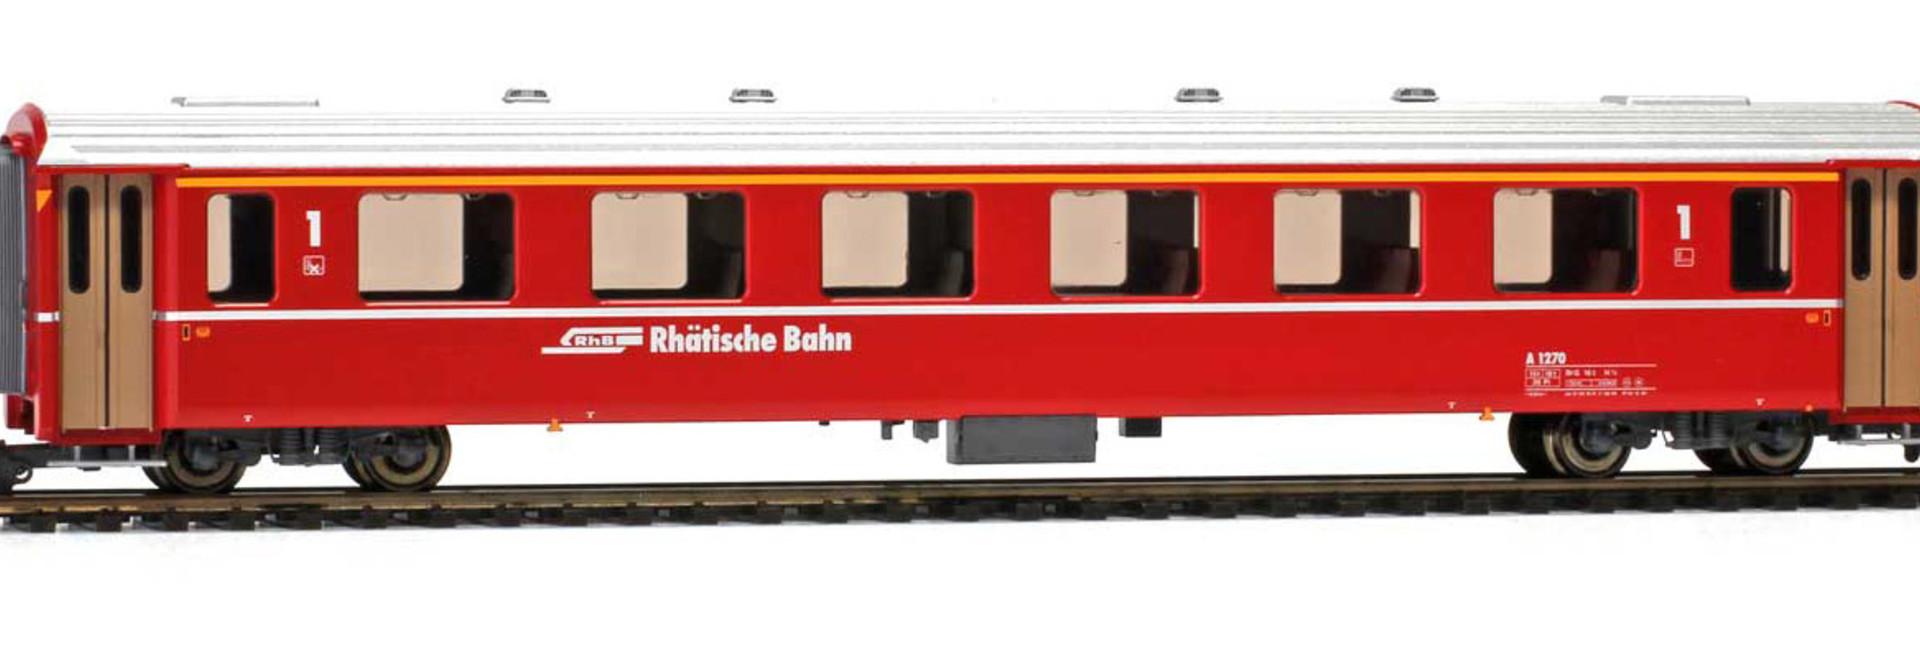 3242130 RhB A 1270 Einheitswagen II rot